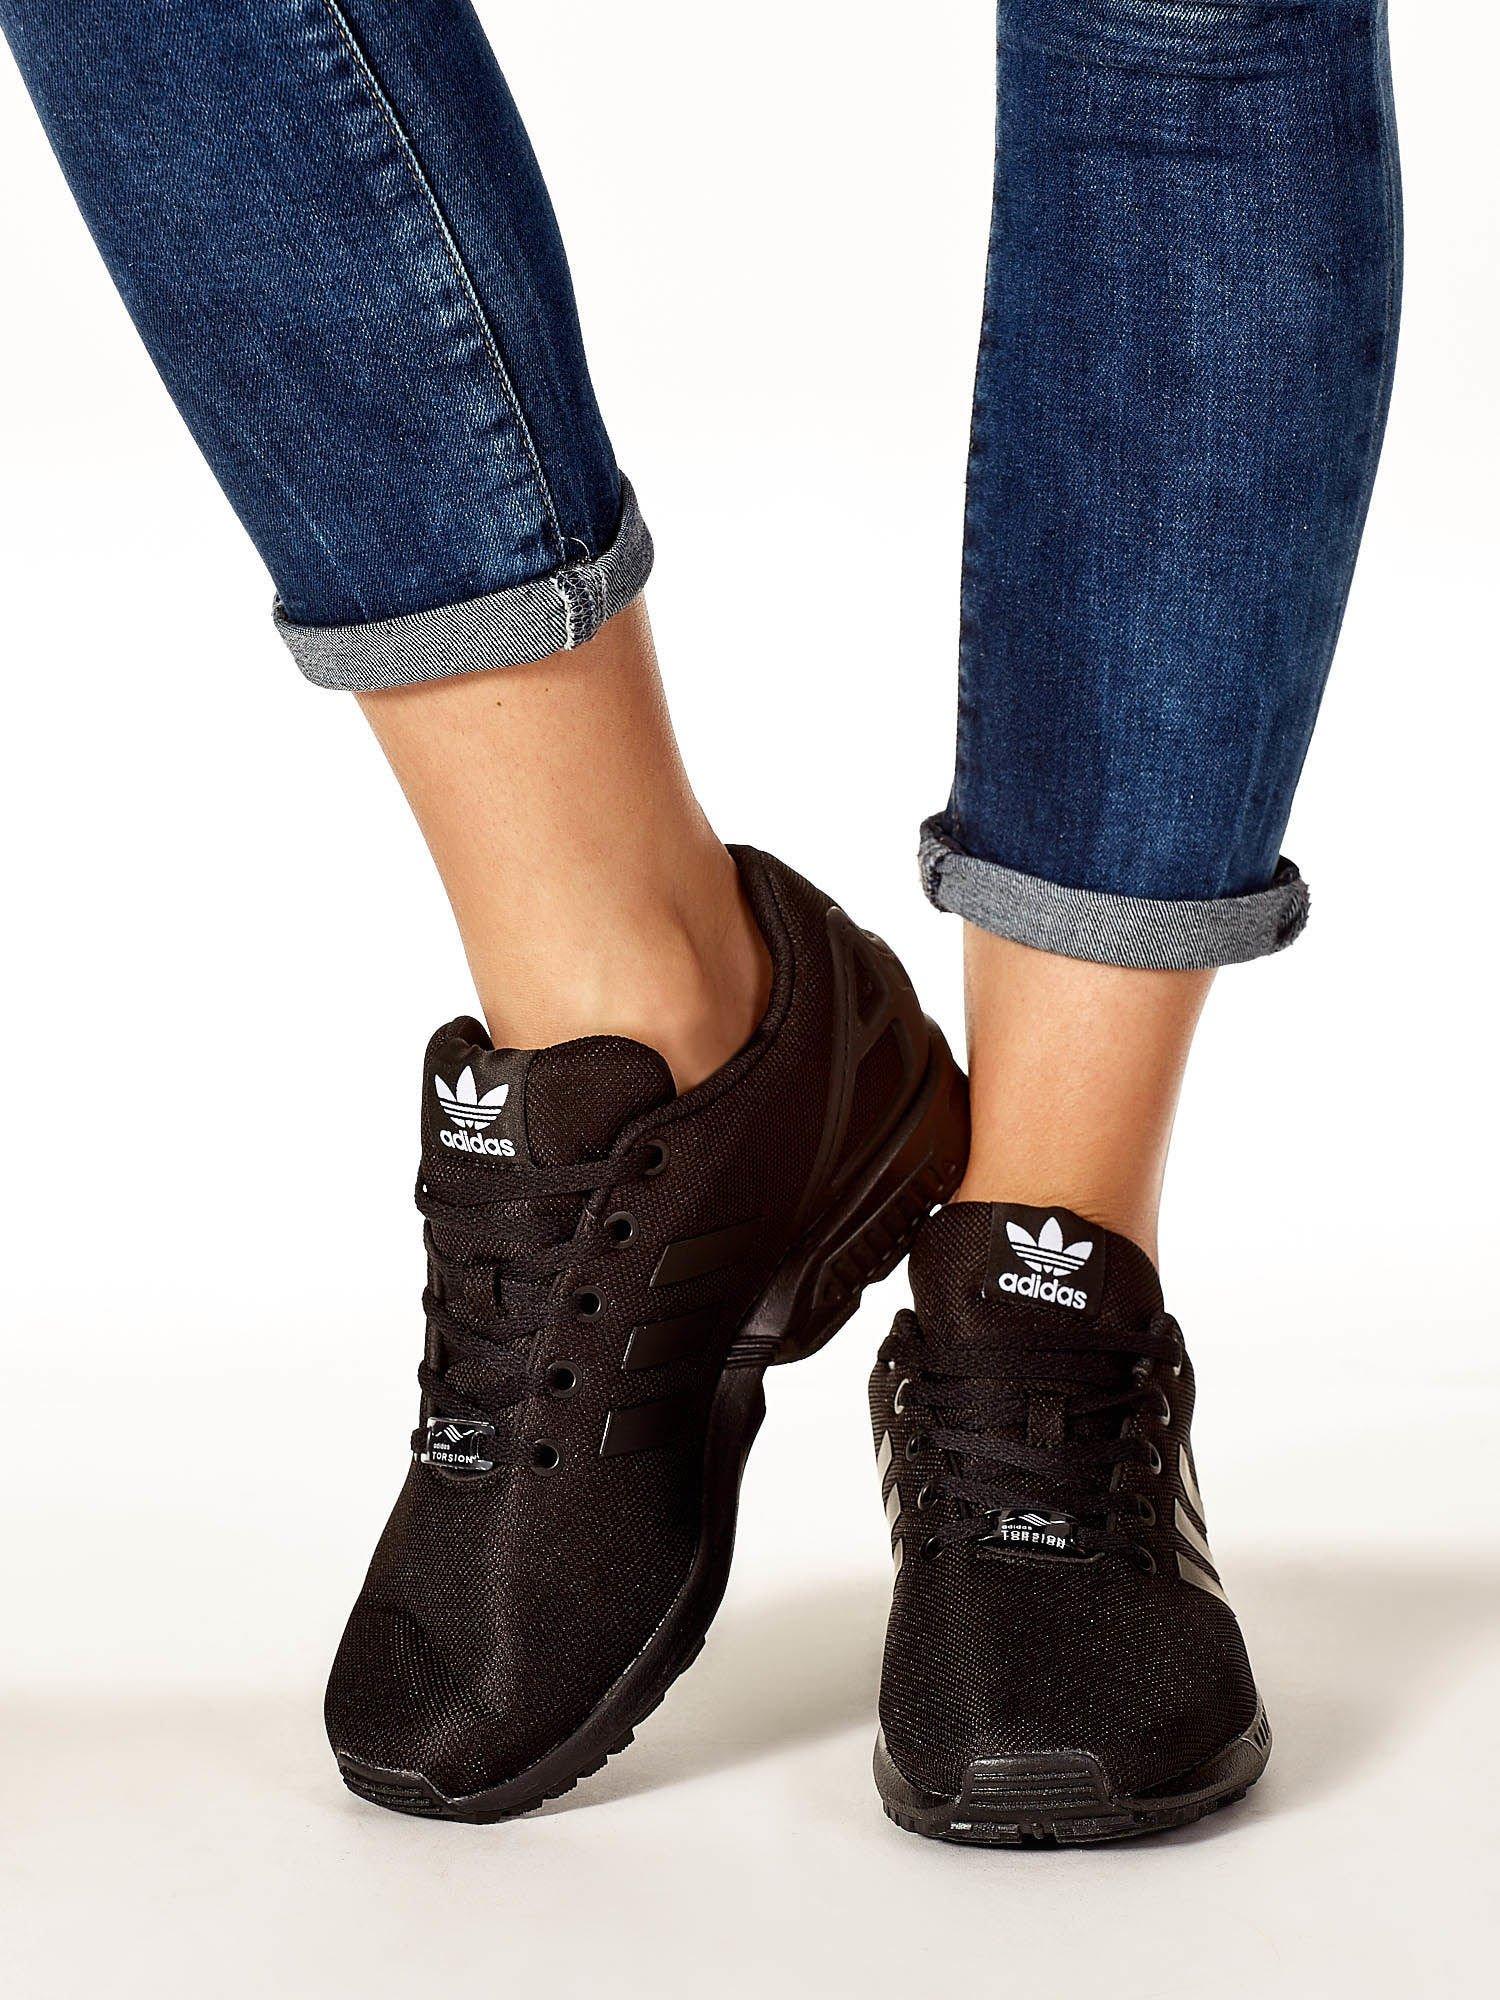 adidasy damskie adidas czarne